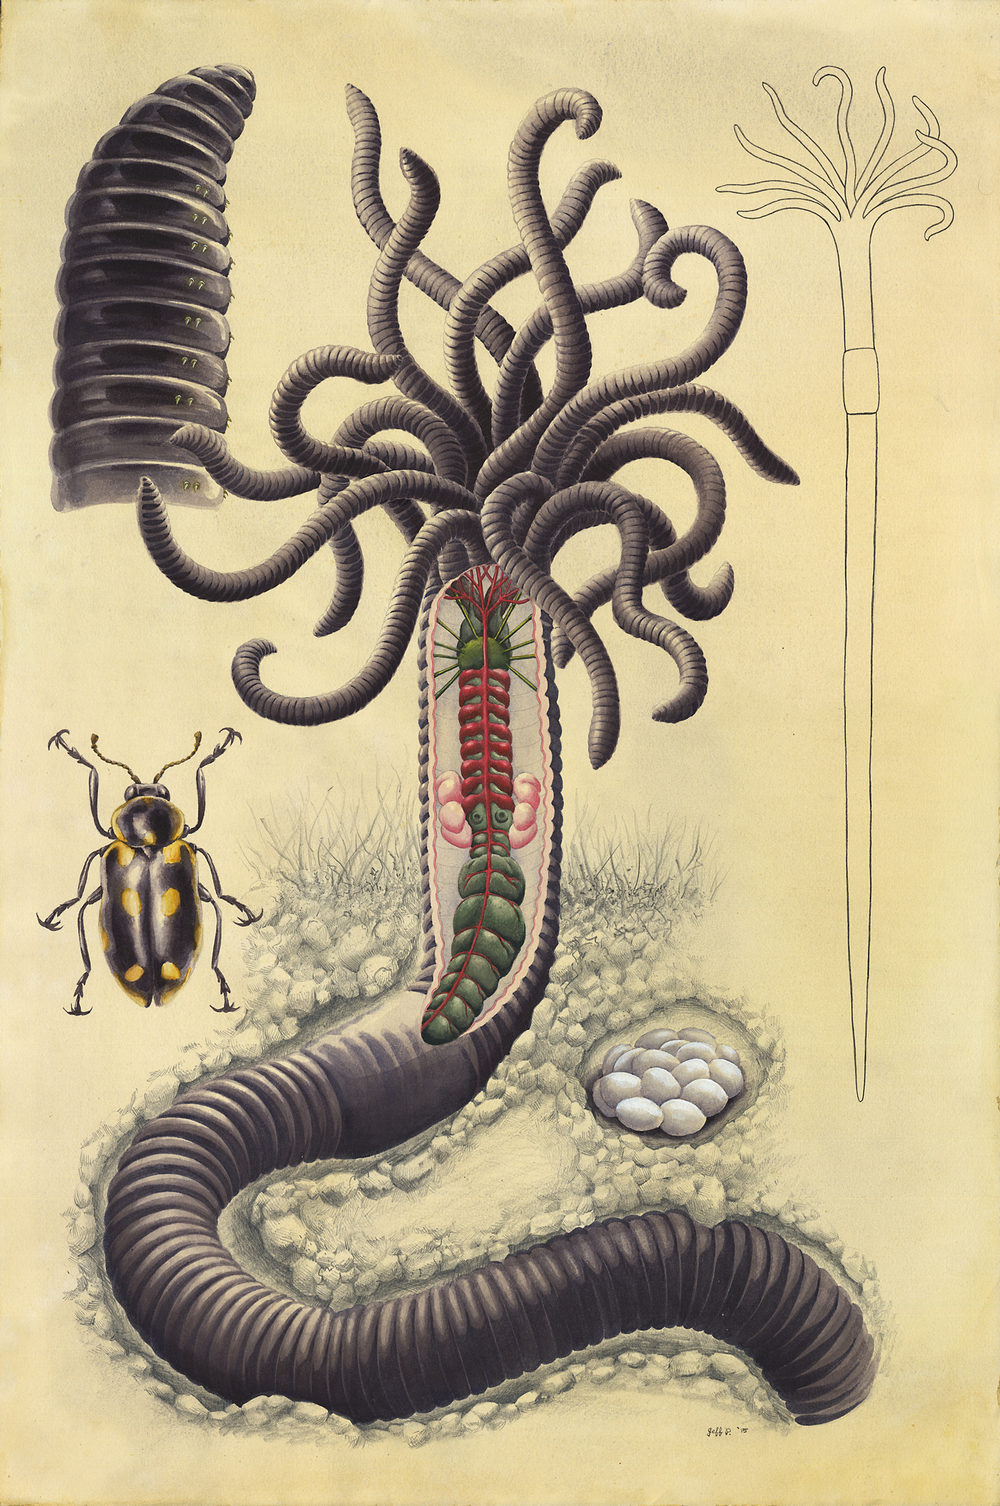 Hydra Worm (Lumbricus Hydridae)